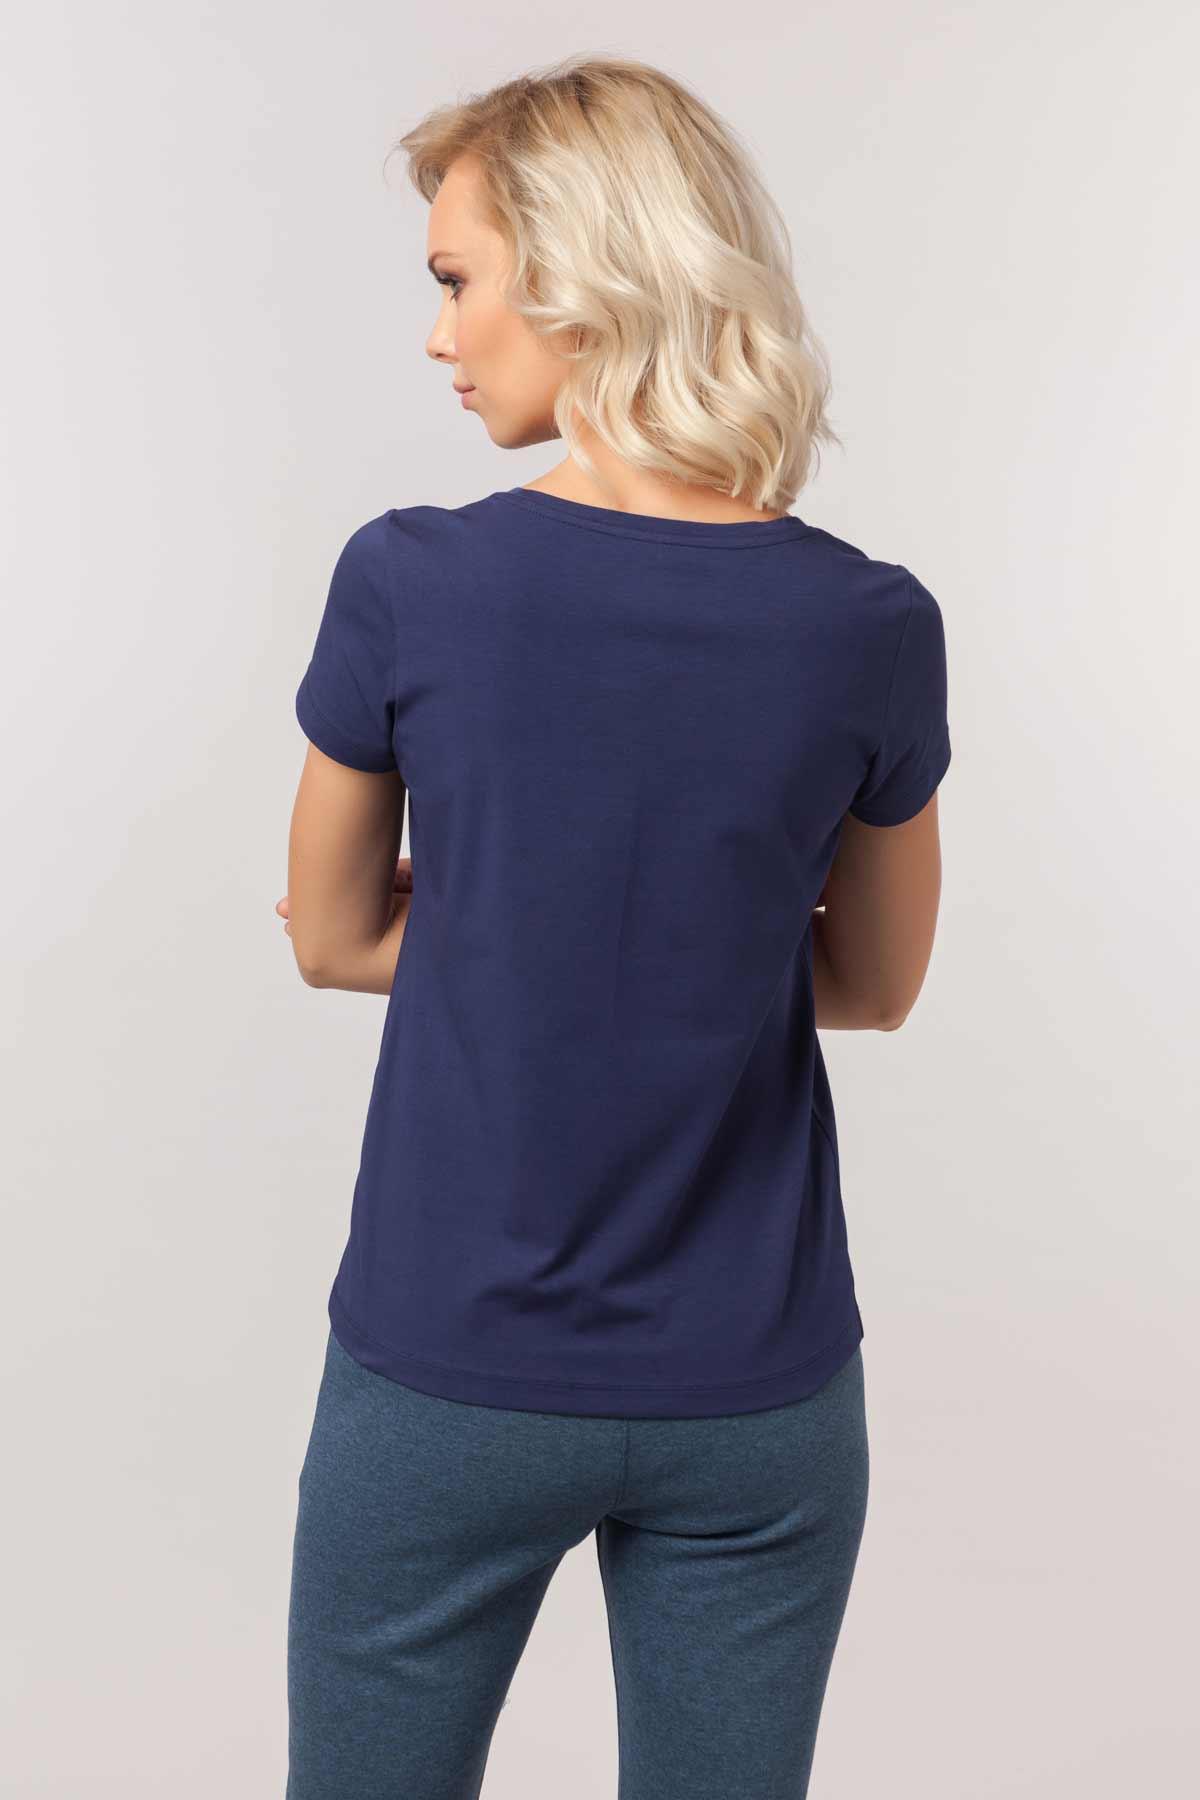 Bilcee Lacivert Likralı Pamuklu Kadın T-Shirt EW-3006 BİLCEE